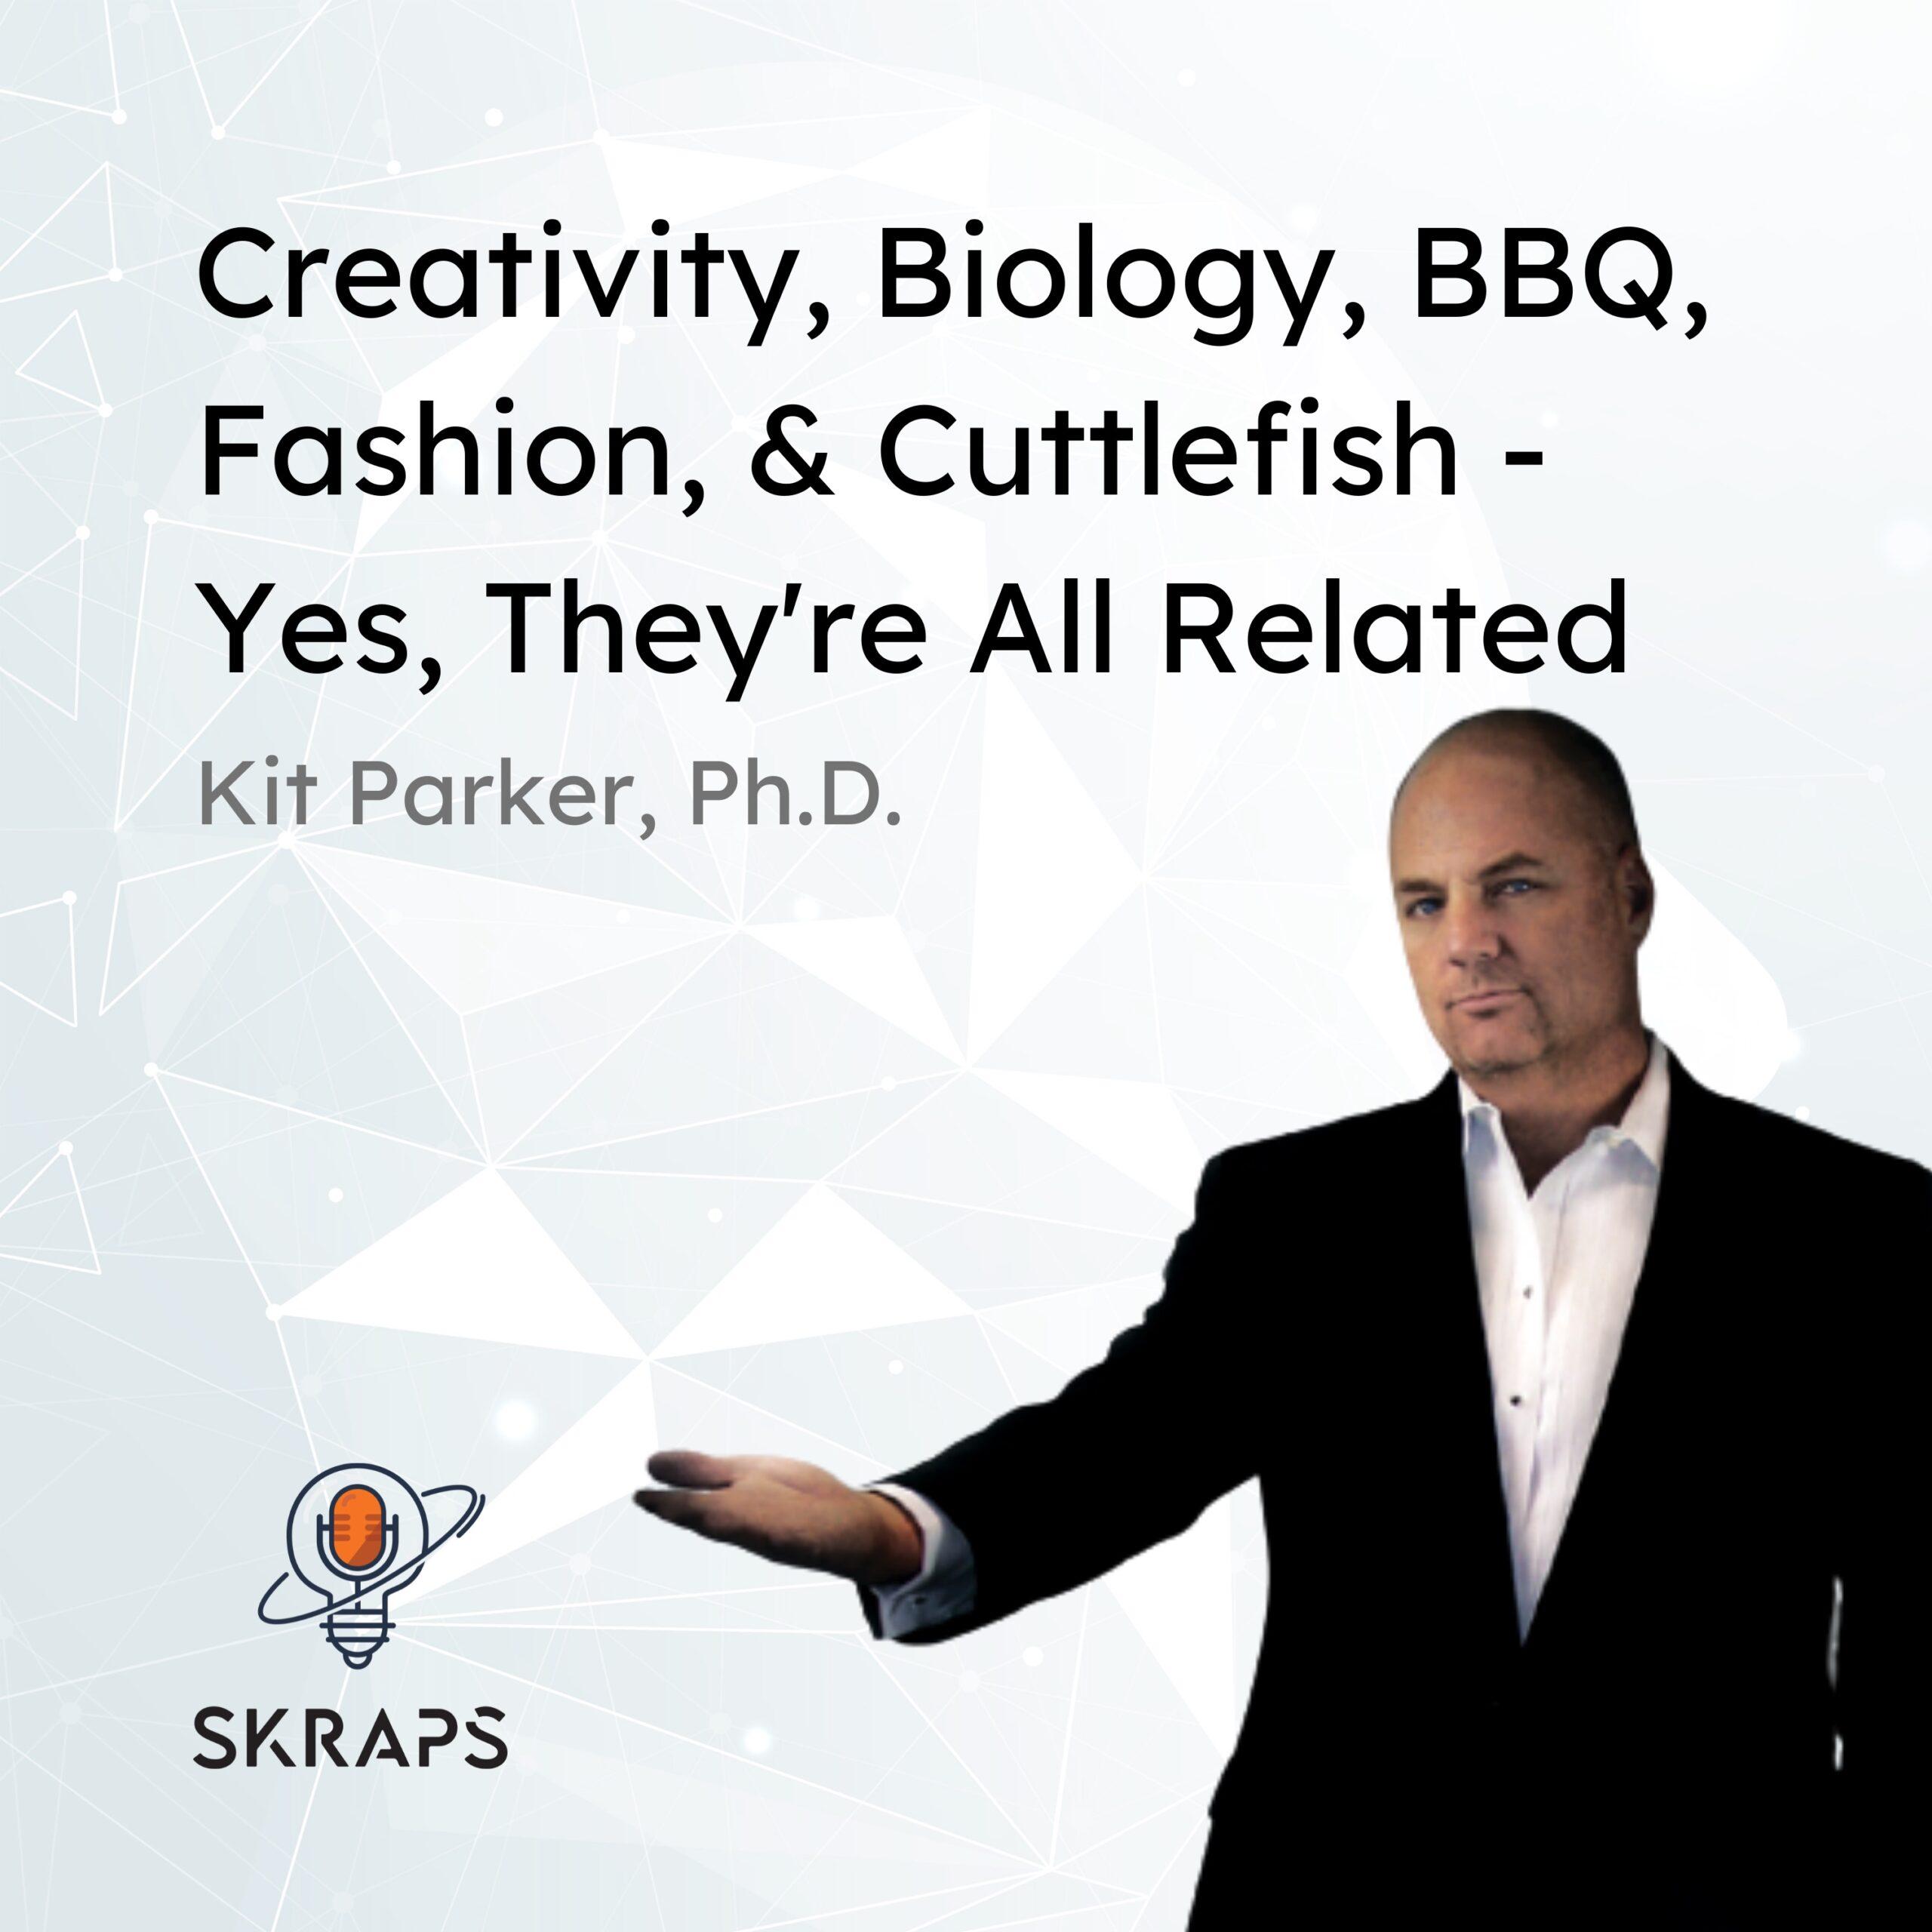 Play-doh & creativity, cardiac biology & biomechanics, Desora Barbecue, Fashion, and cuttlefish